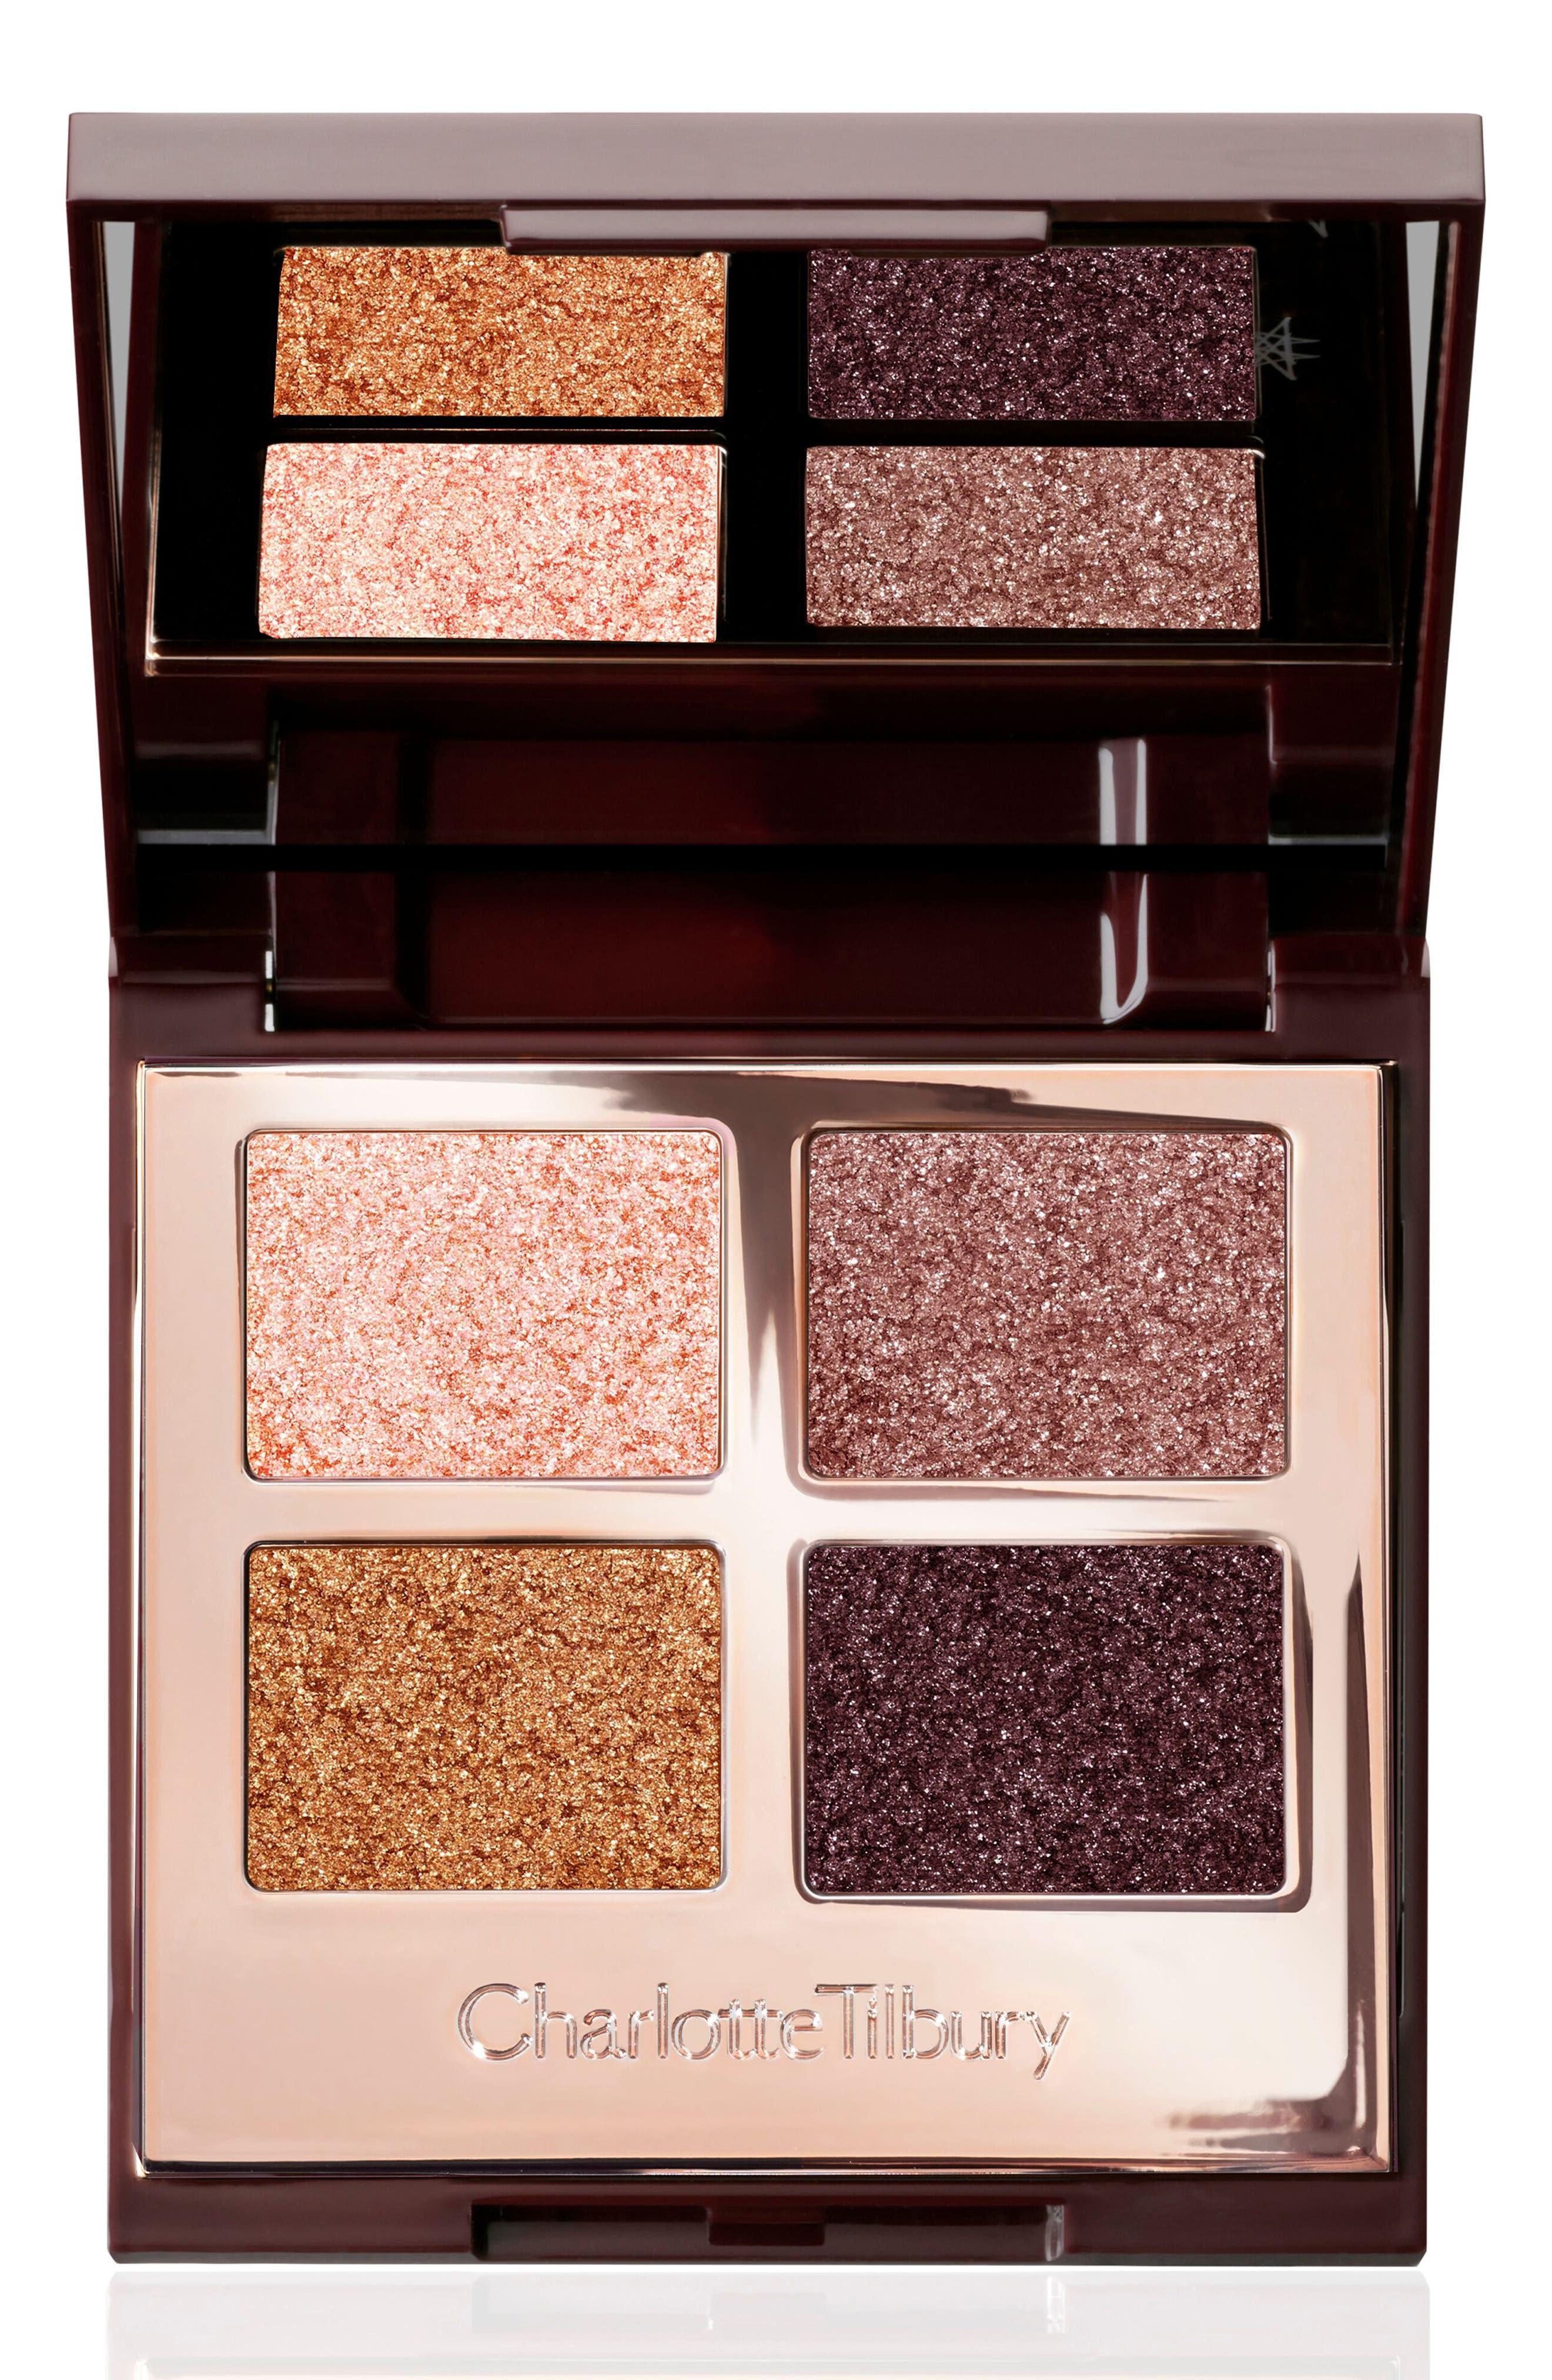 Celestial Eyes Luxury Palette Of Pops Eyeshadow Quad by Charlotte Tilbury